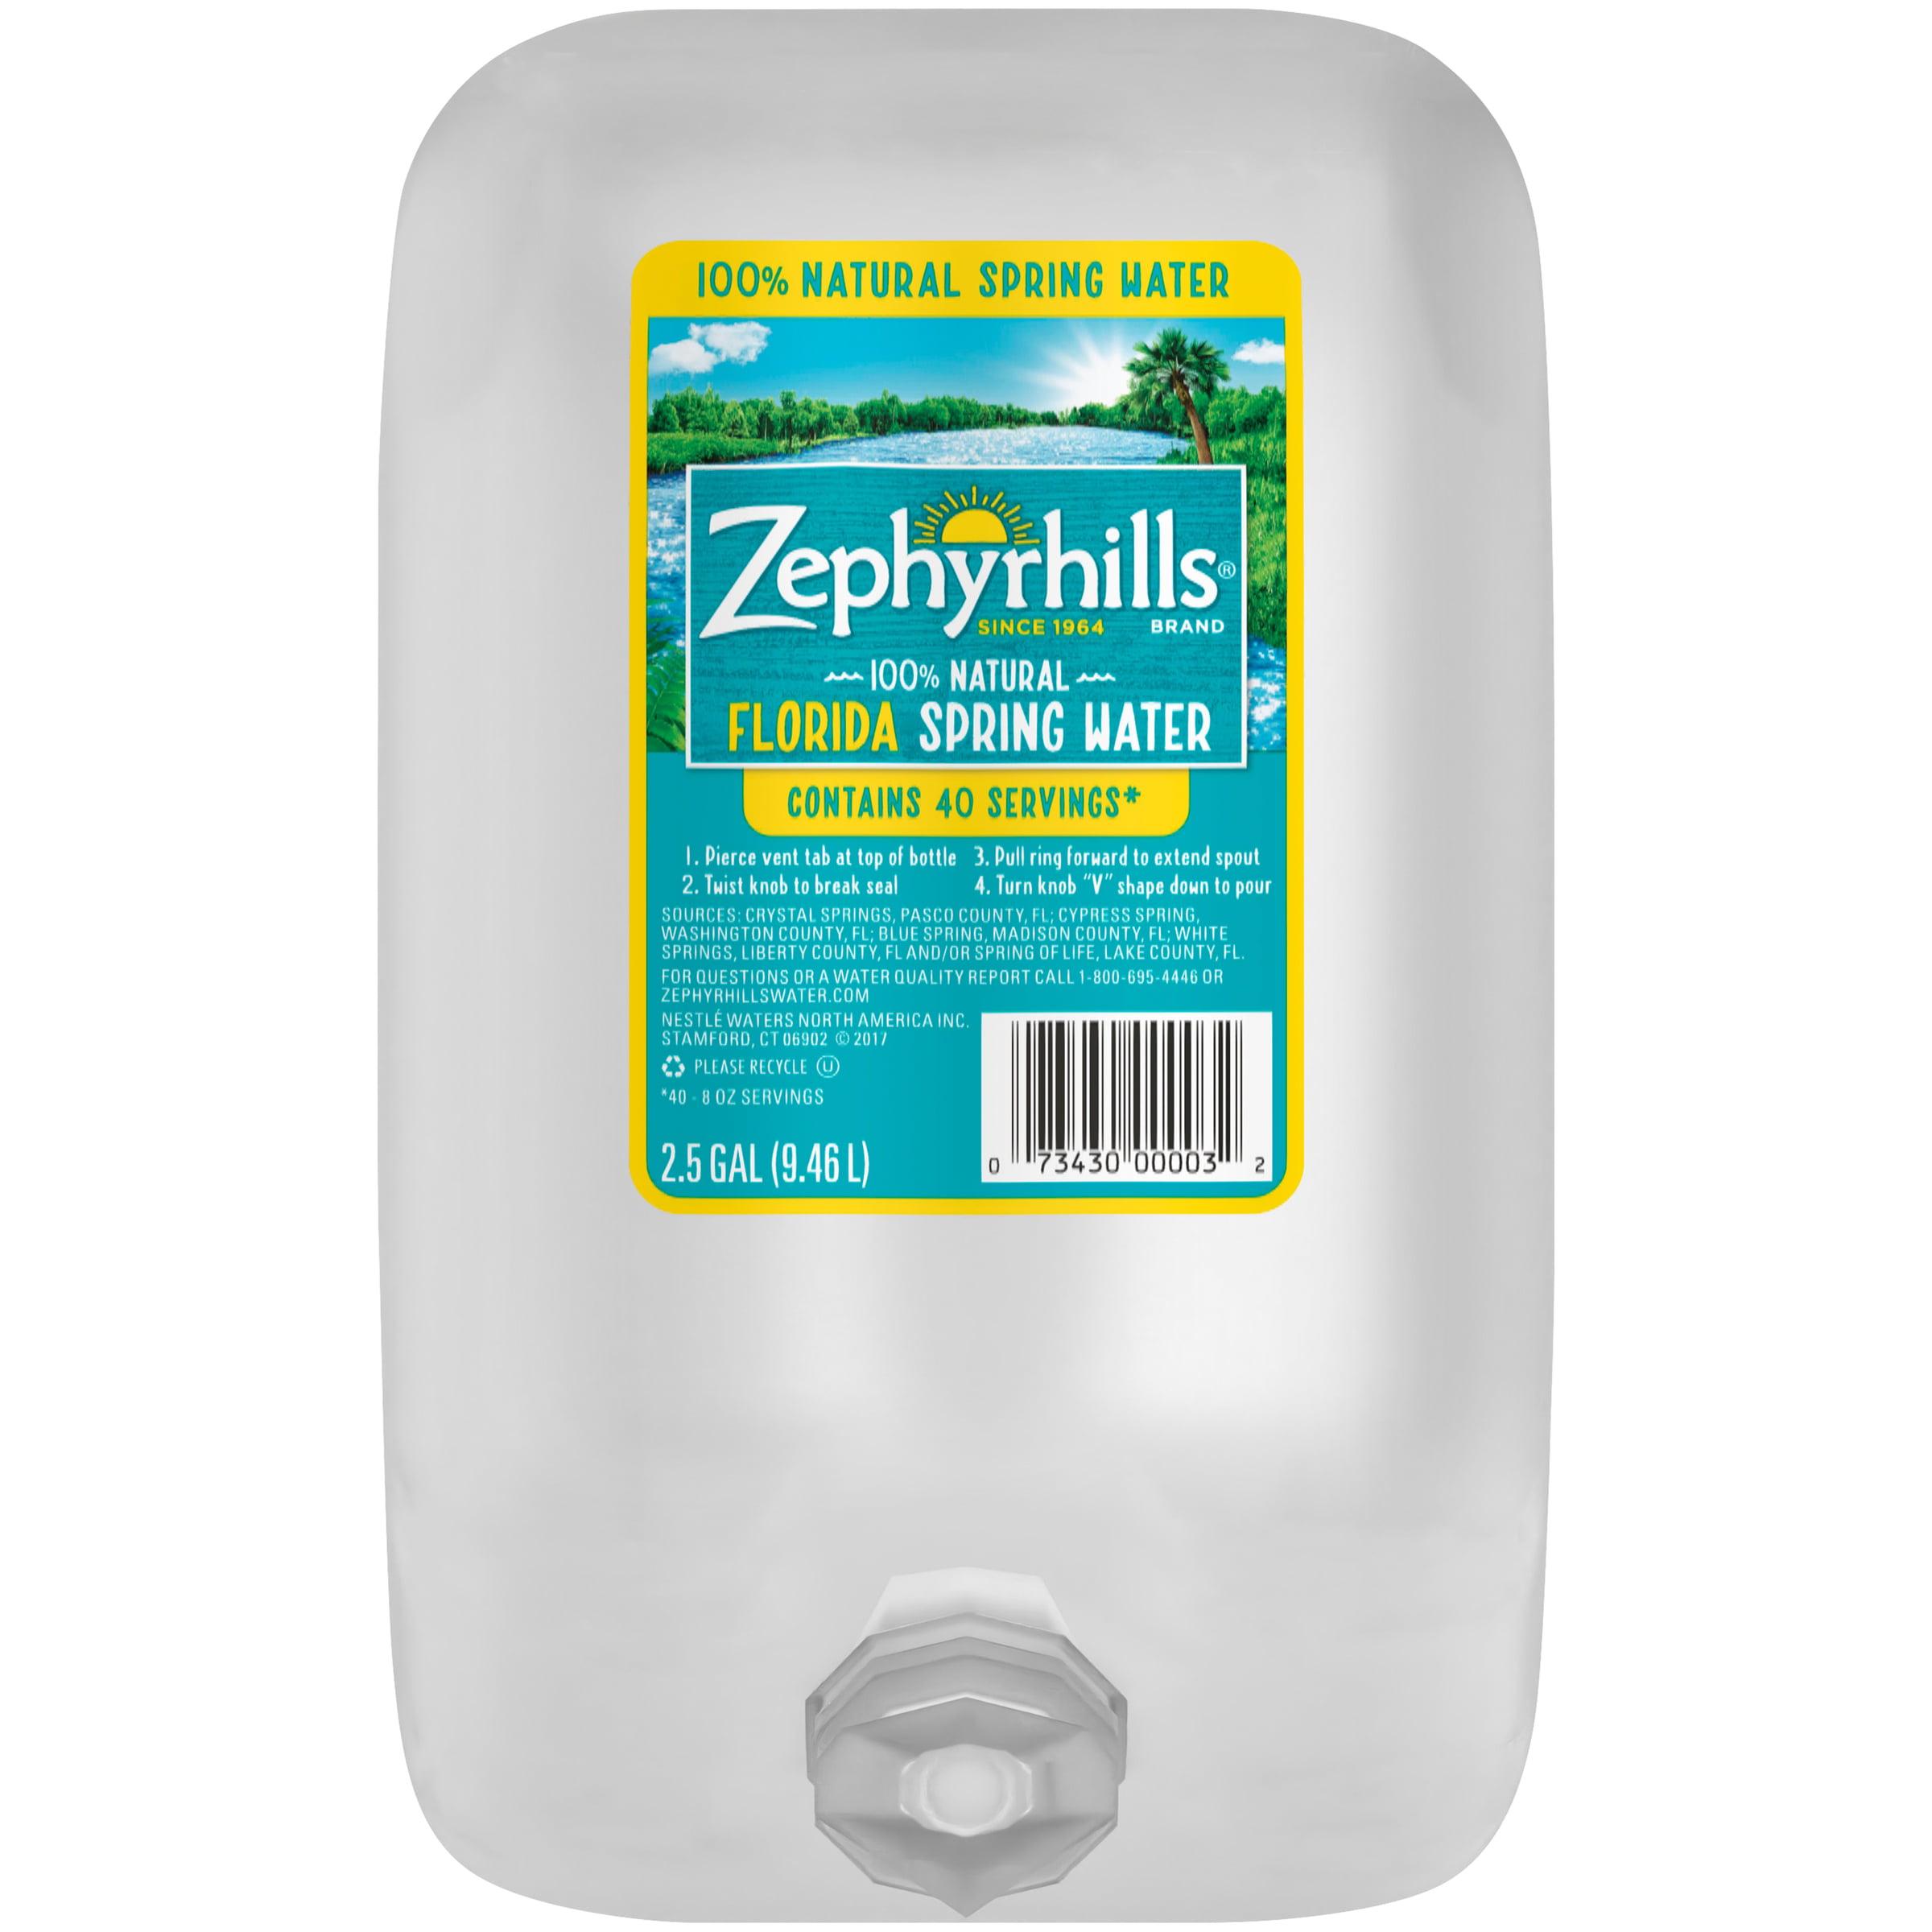 Zephyrhills Sports Bottle: Zephyrhills Natural Spring Water, 2.5 Gal. Bottle